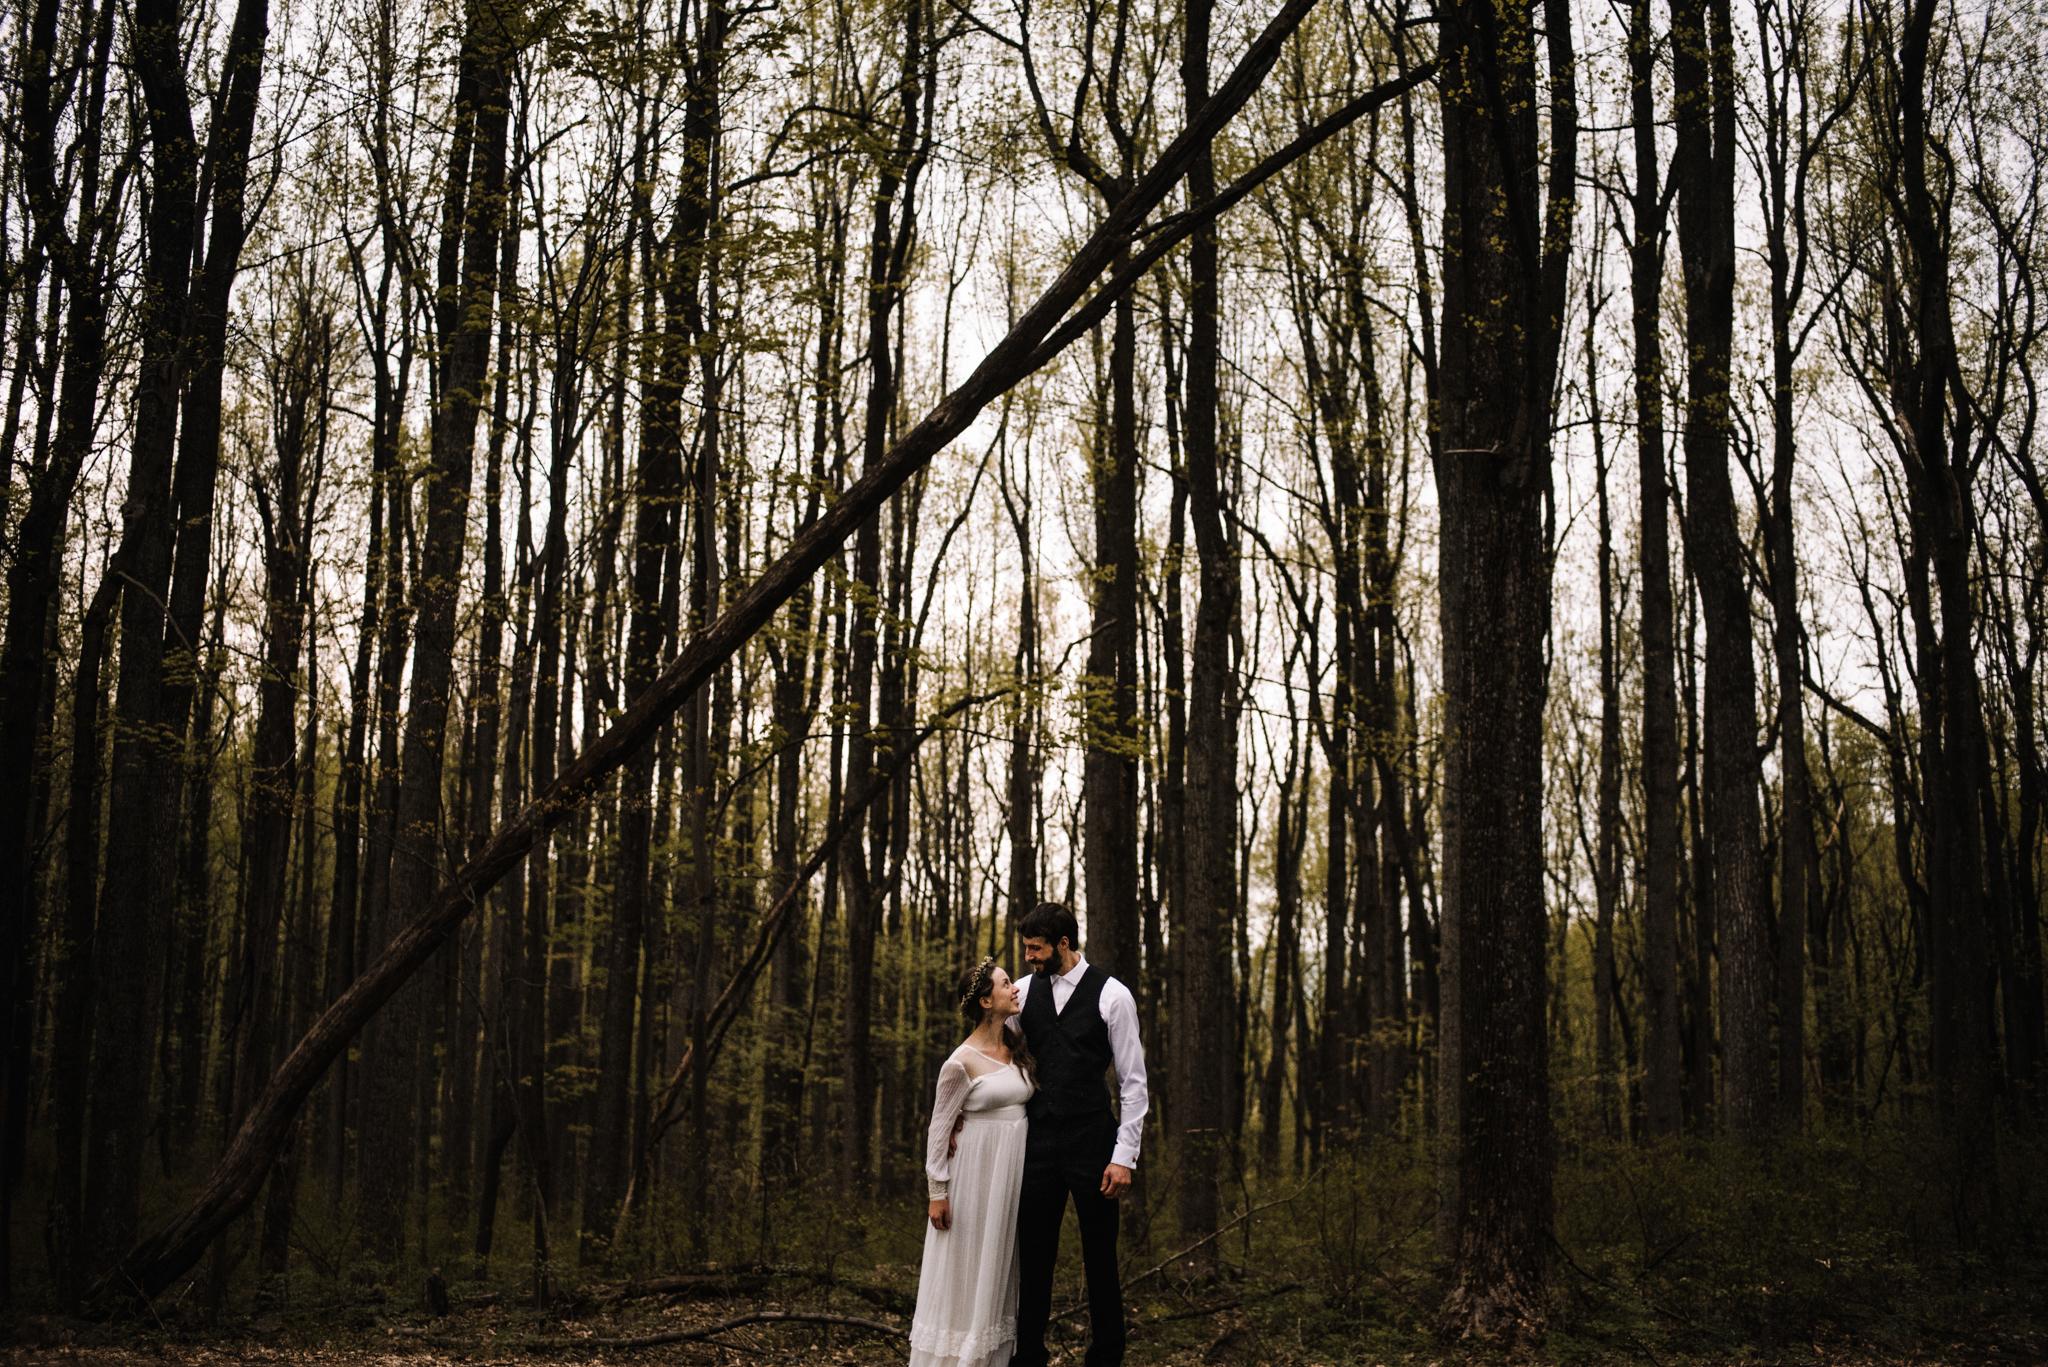 Lisa and Stuart - Post Wedding Couple Portraits - White Sails Creative - Blue Ridge Mountains - Sunrise Shenandoah National Park_31.JPG